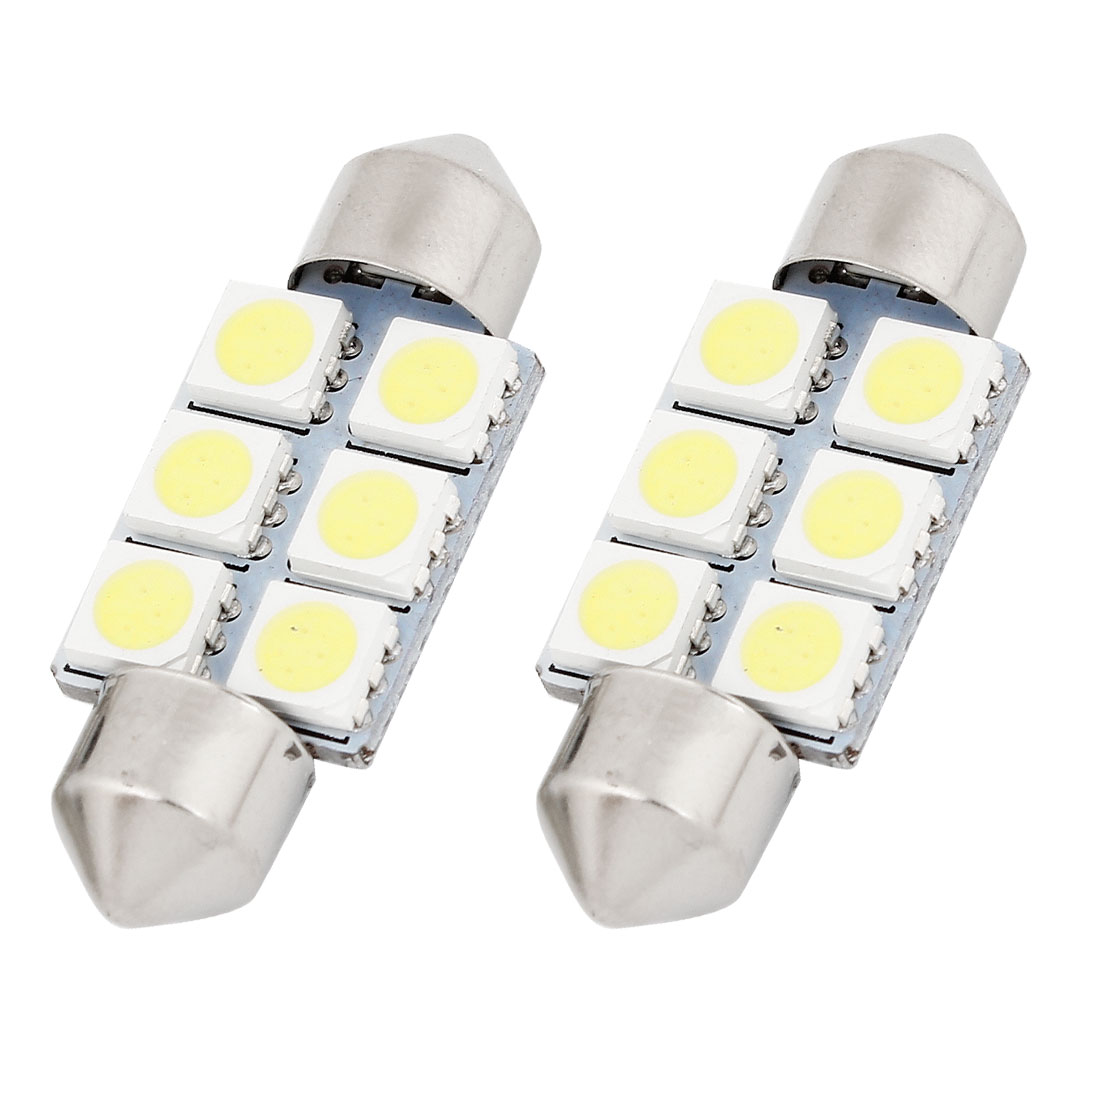 2 X White 36MM 5050 6SMD Festoon Dome Map Interior LED Light bulbs C5W 6411 6418